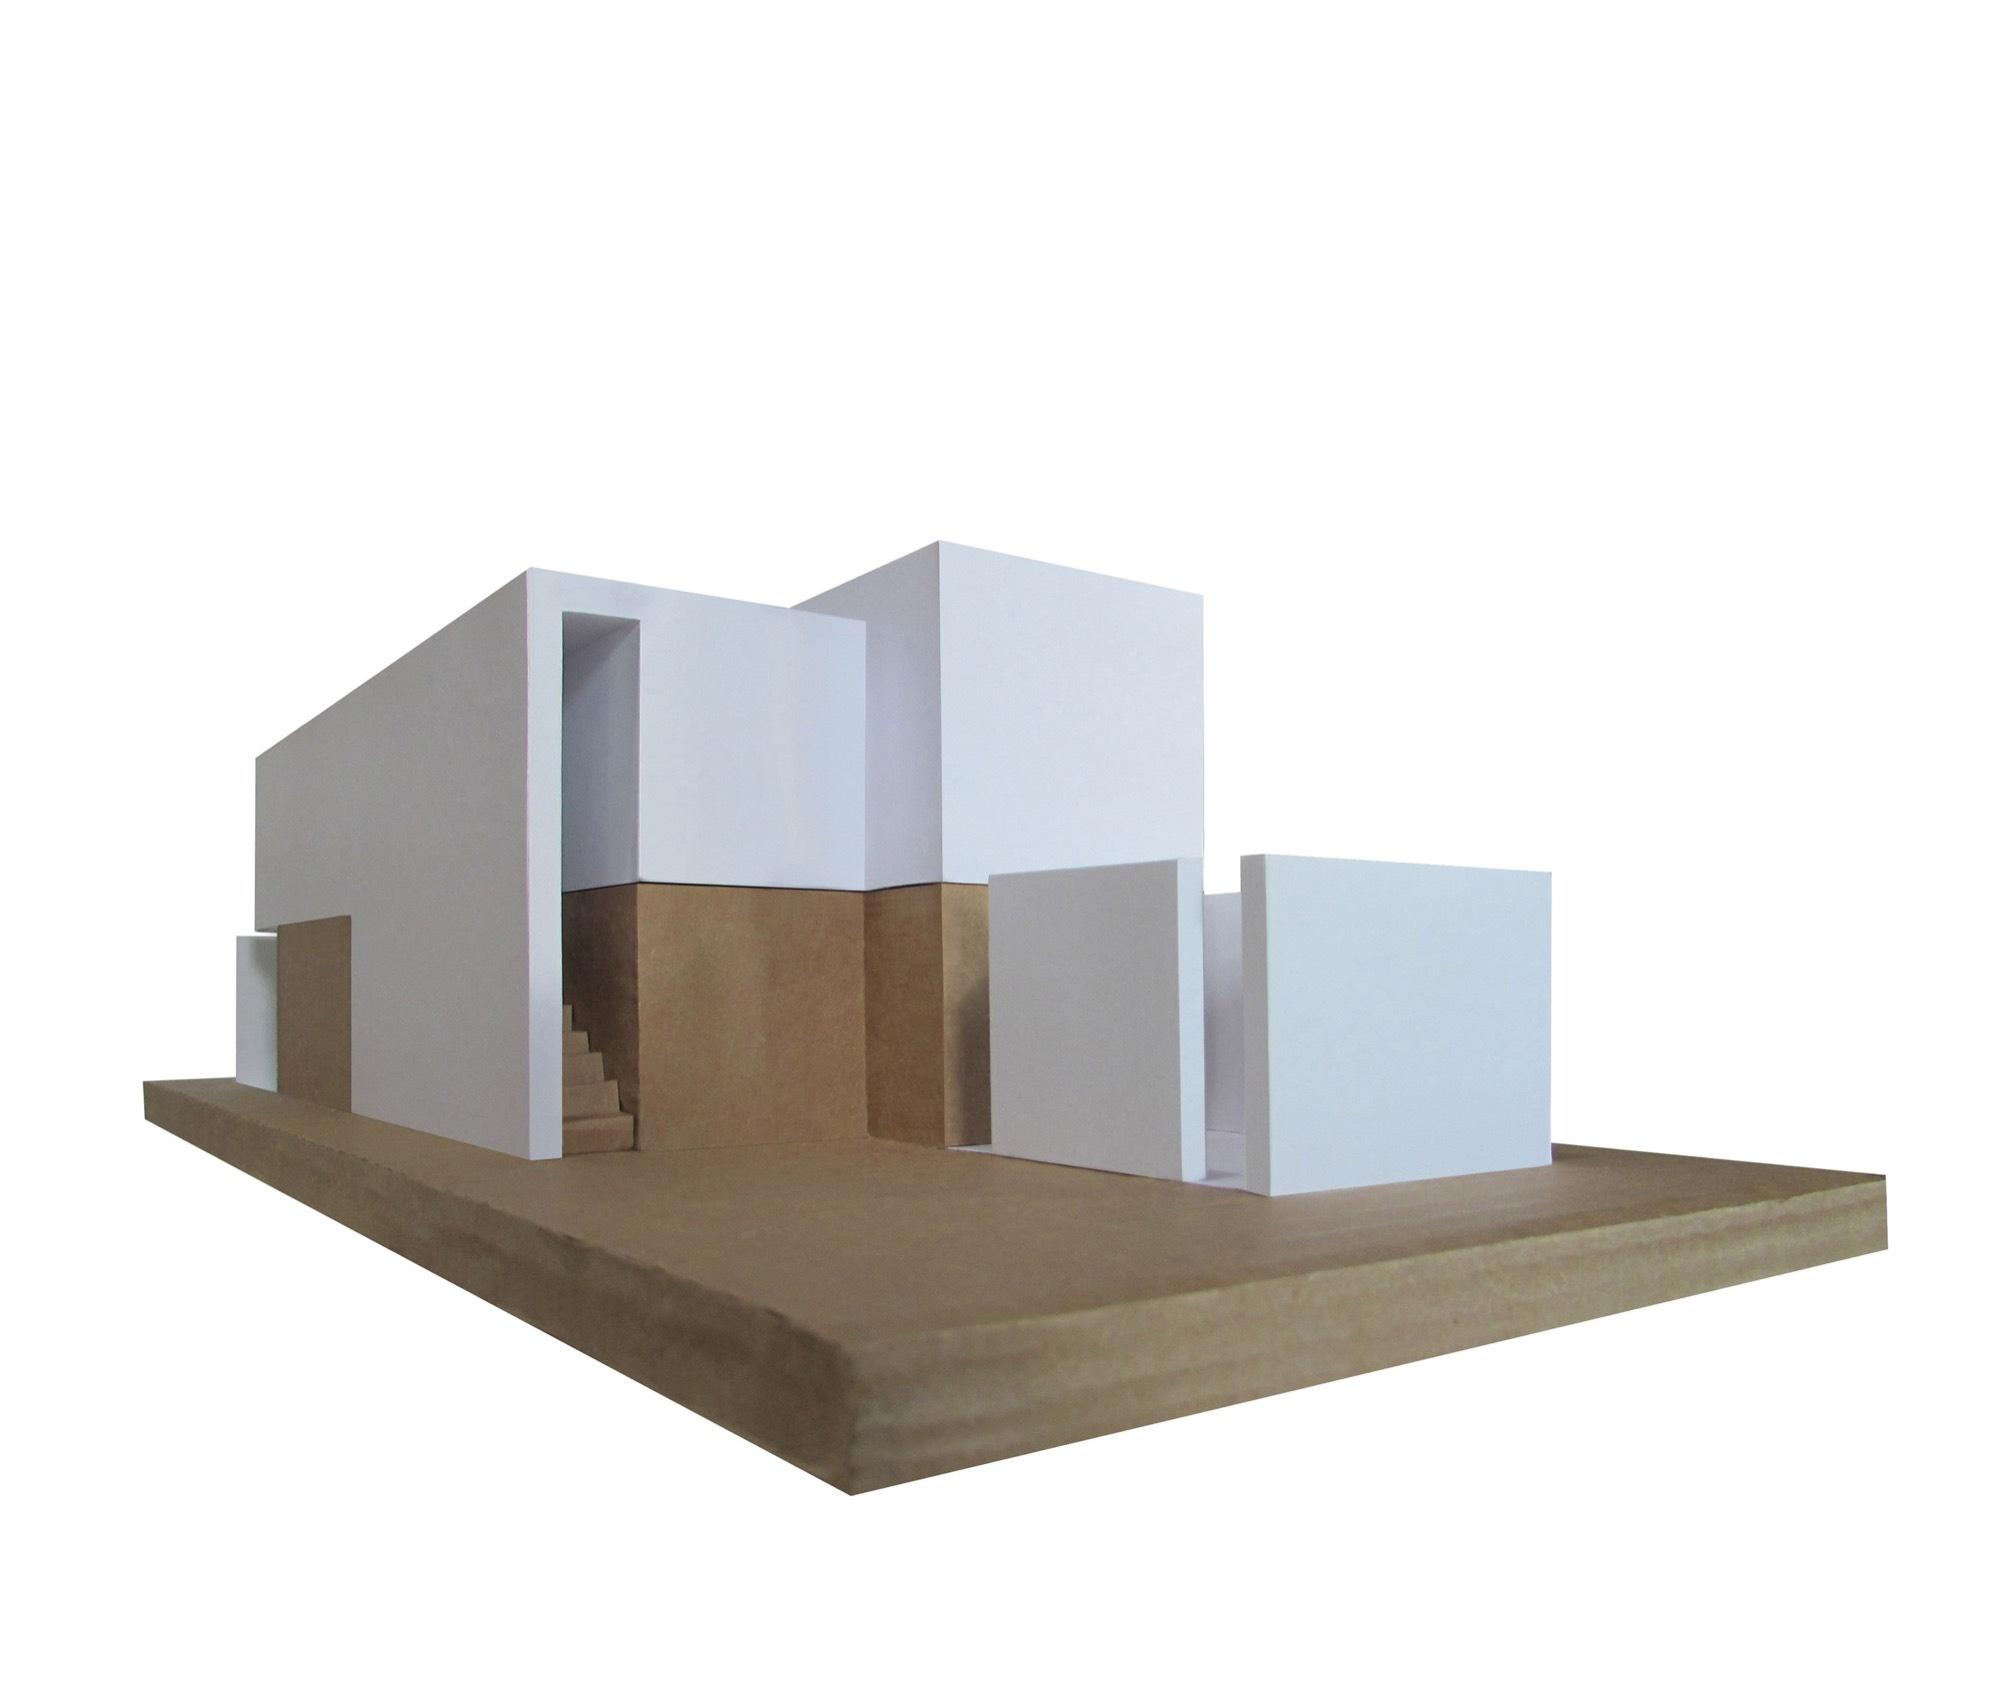 Galer a de casa estudio intersticial arquitectura 24 for Casa estudio arquitectura